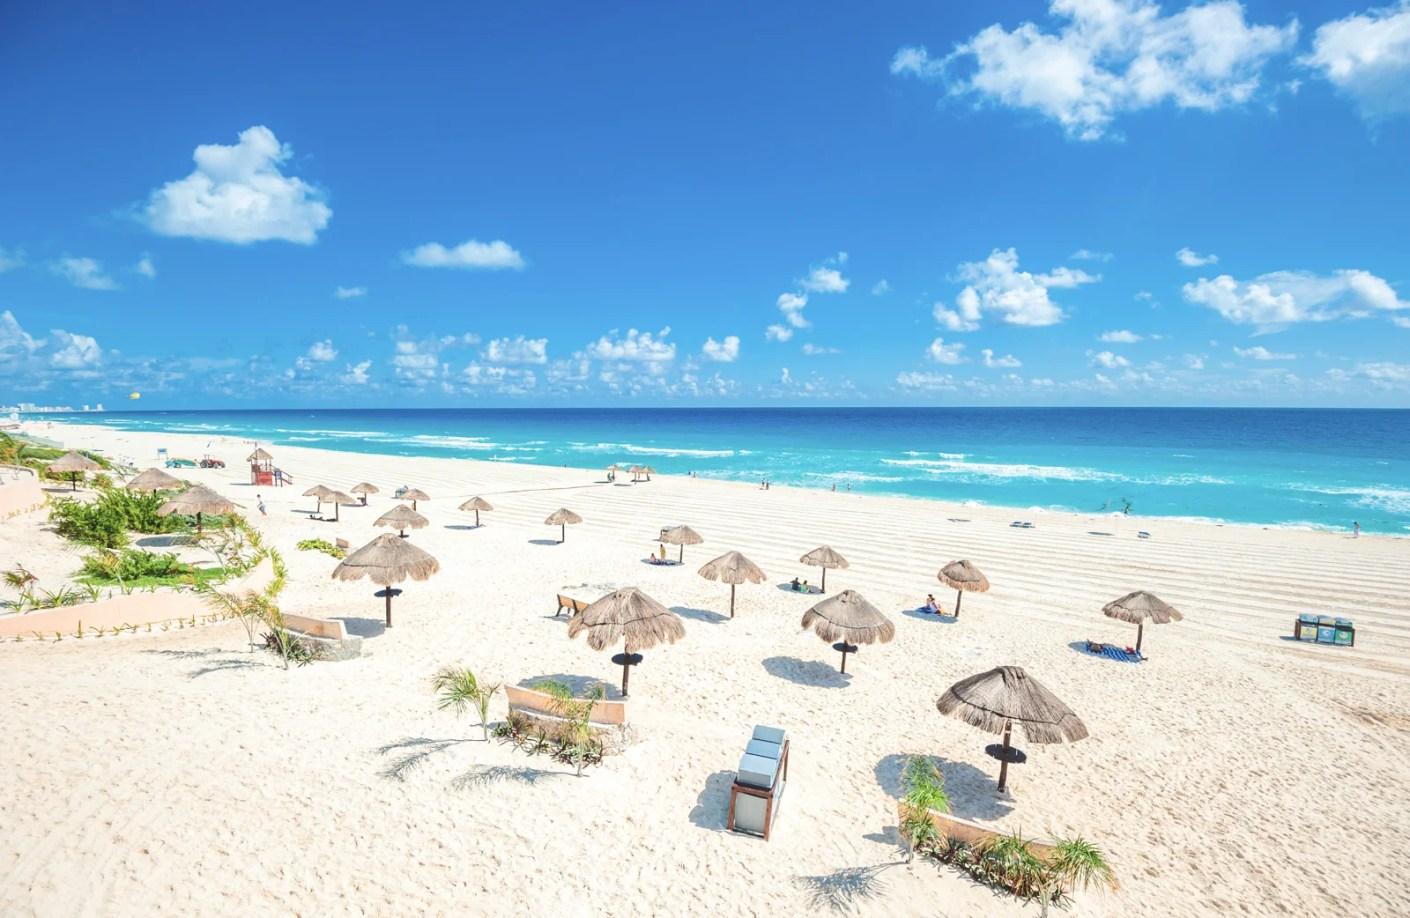 An empty beach in Cancun, Mexico. (Photo via Shutterstock)